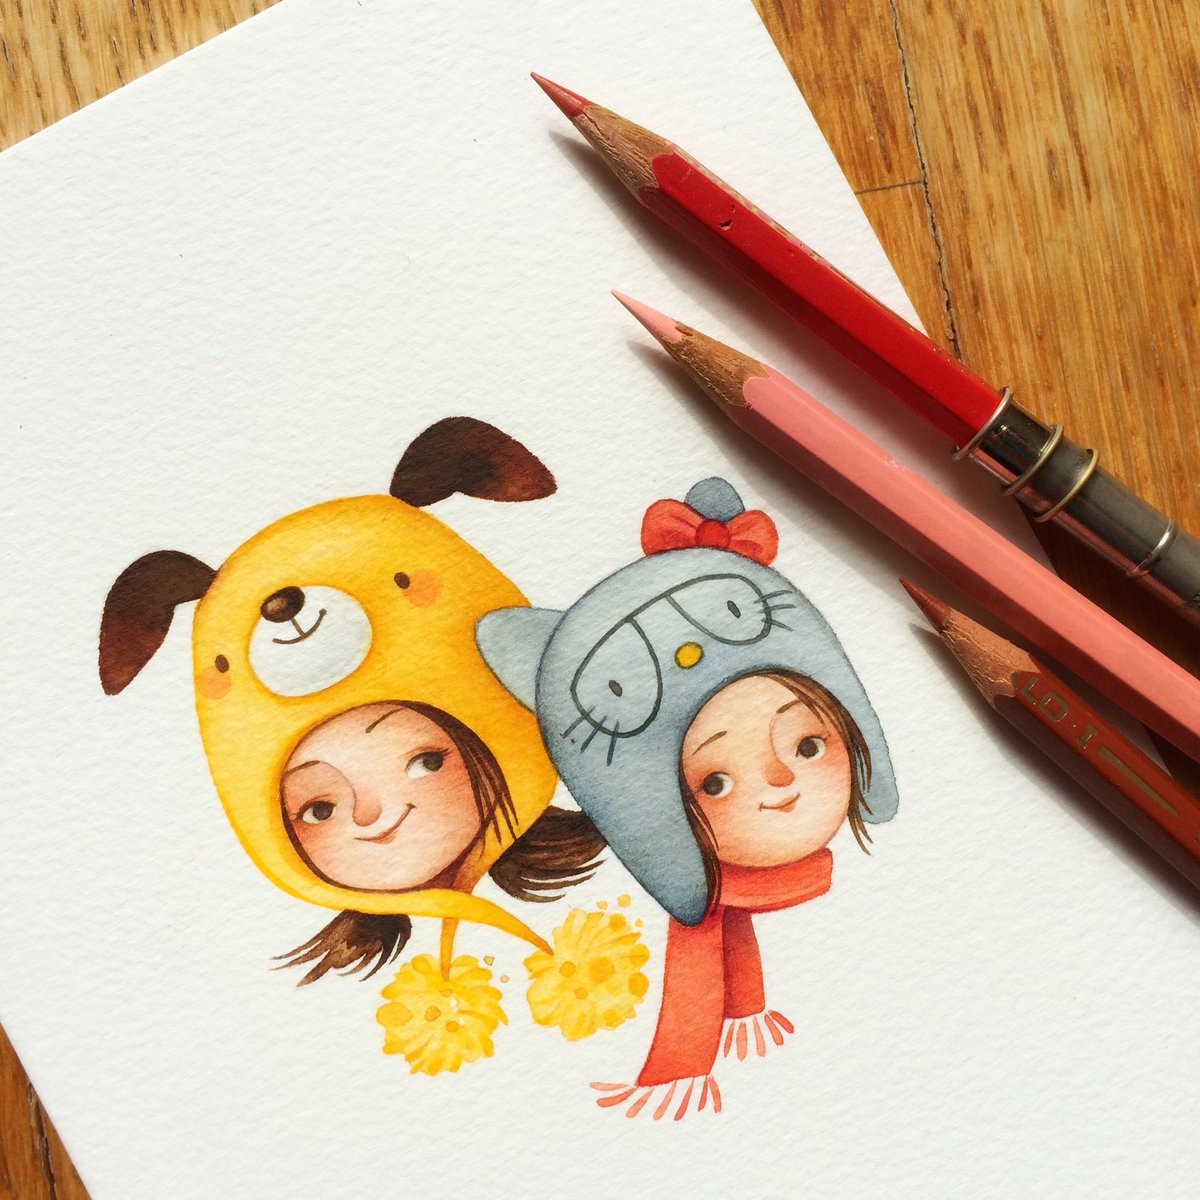 Finishing touches and it's done! #kidlitart #childrensbooks #illustration https://t.co/eaPyCubGKa